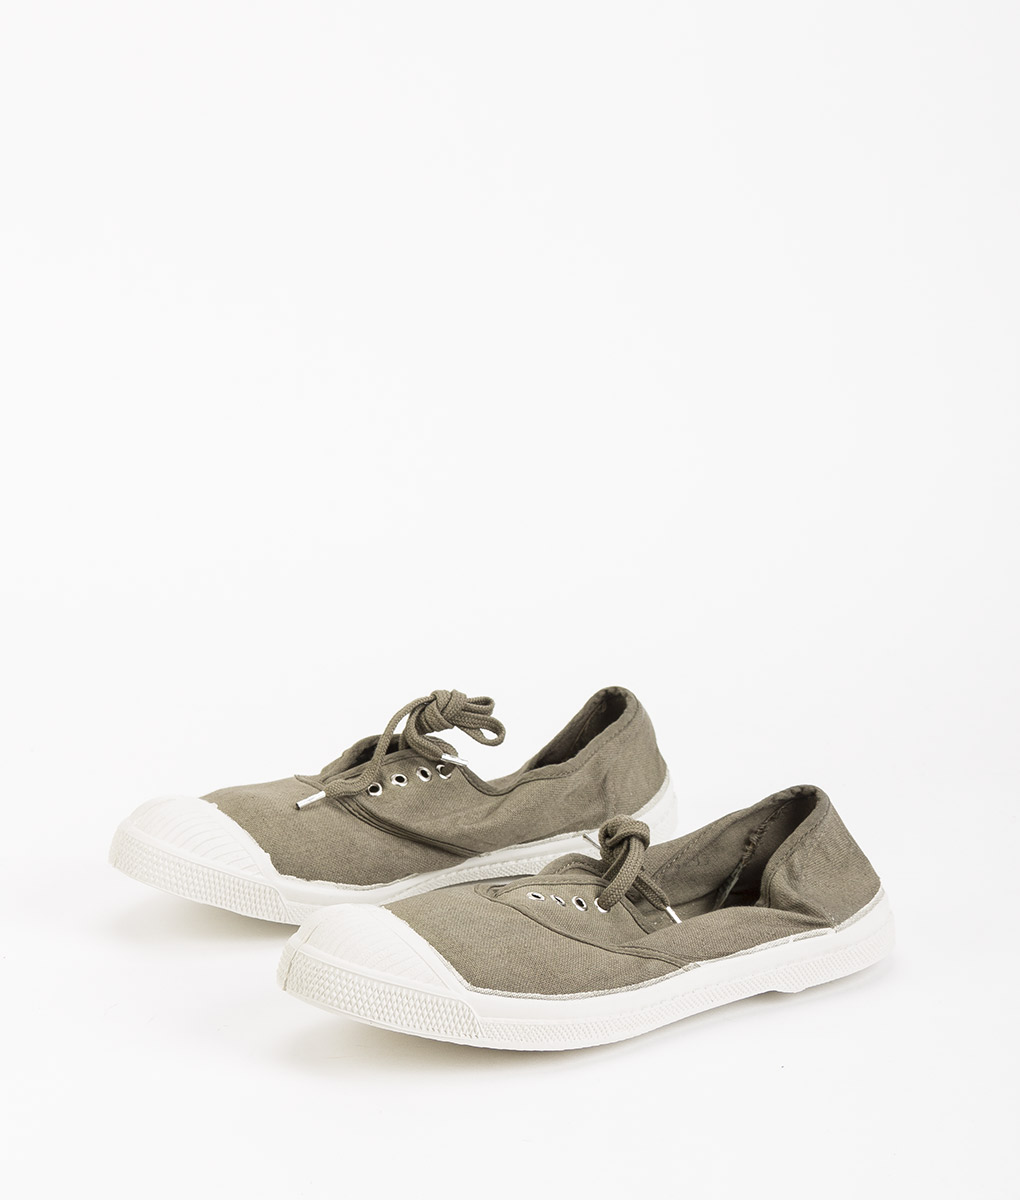 BENSIMON Women Sneakers 15004 TENNIS LACE, Light Khaki 34.99